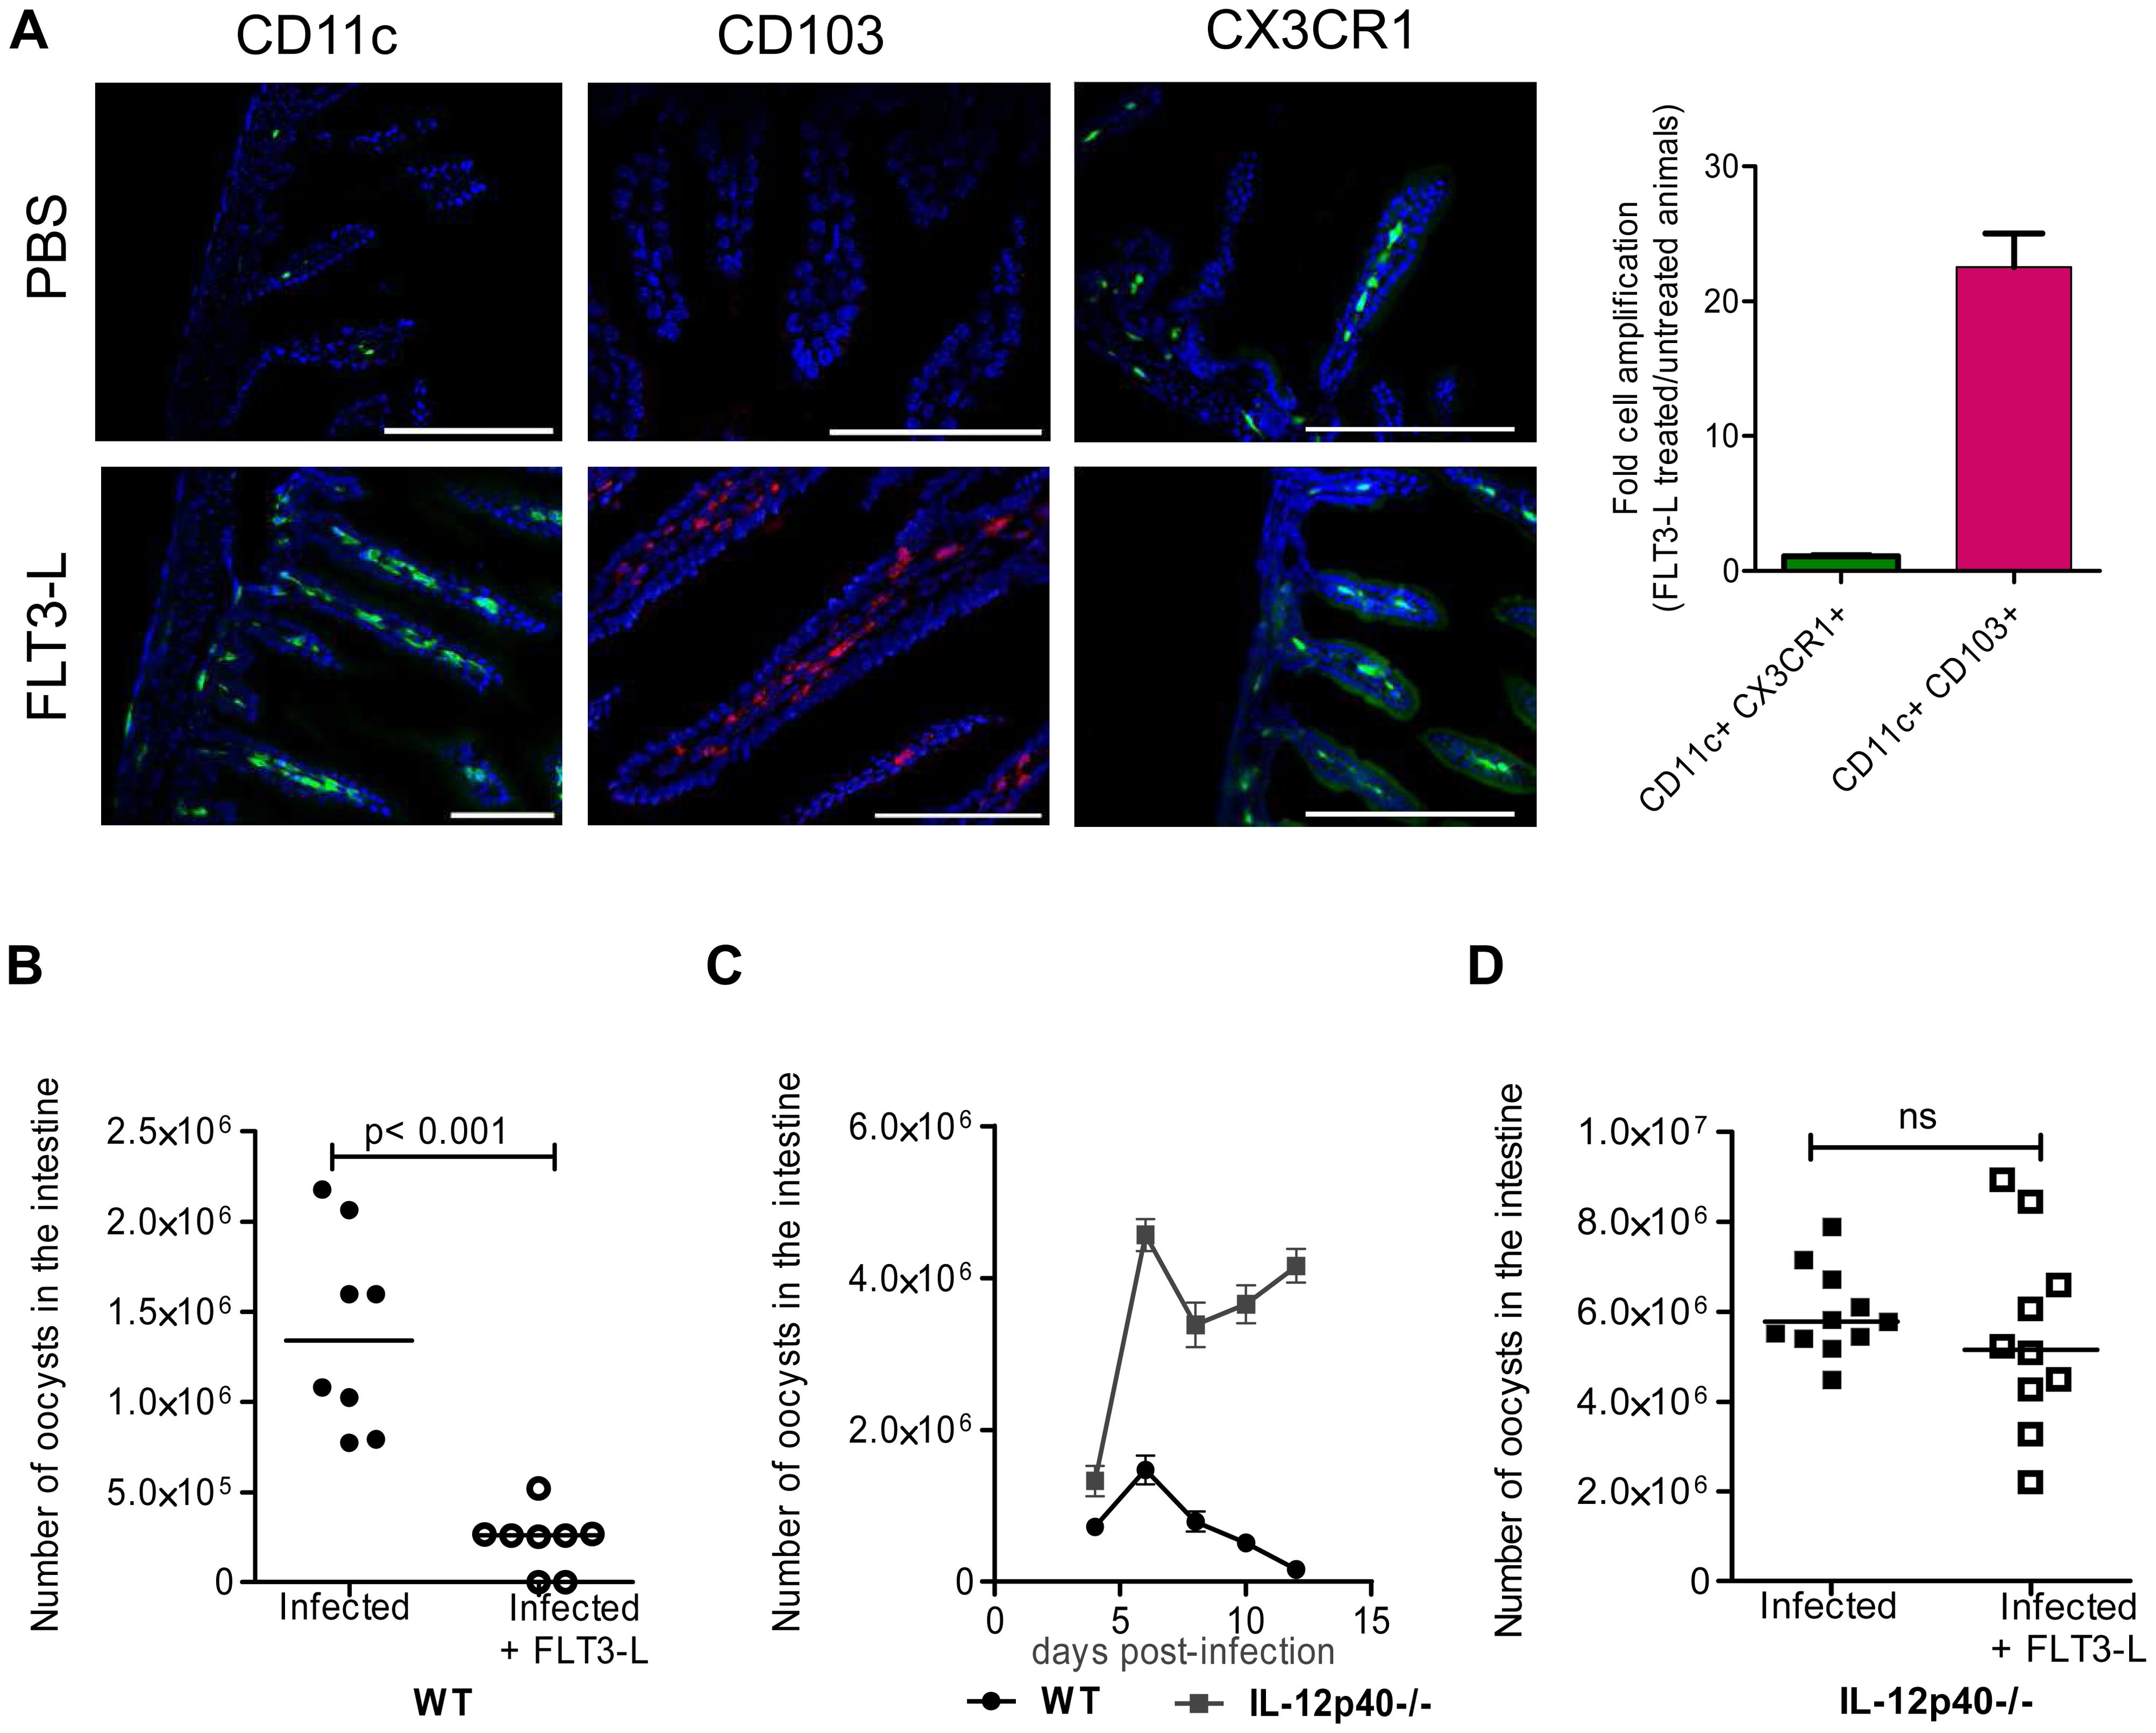 <i>In vivo</i> amplification of CD11c+ CD103+ DC by FLT3-L enhances neonatal resistance to <i>C. parvum</i> infection.